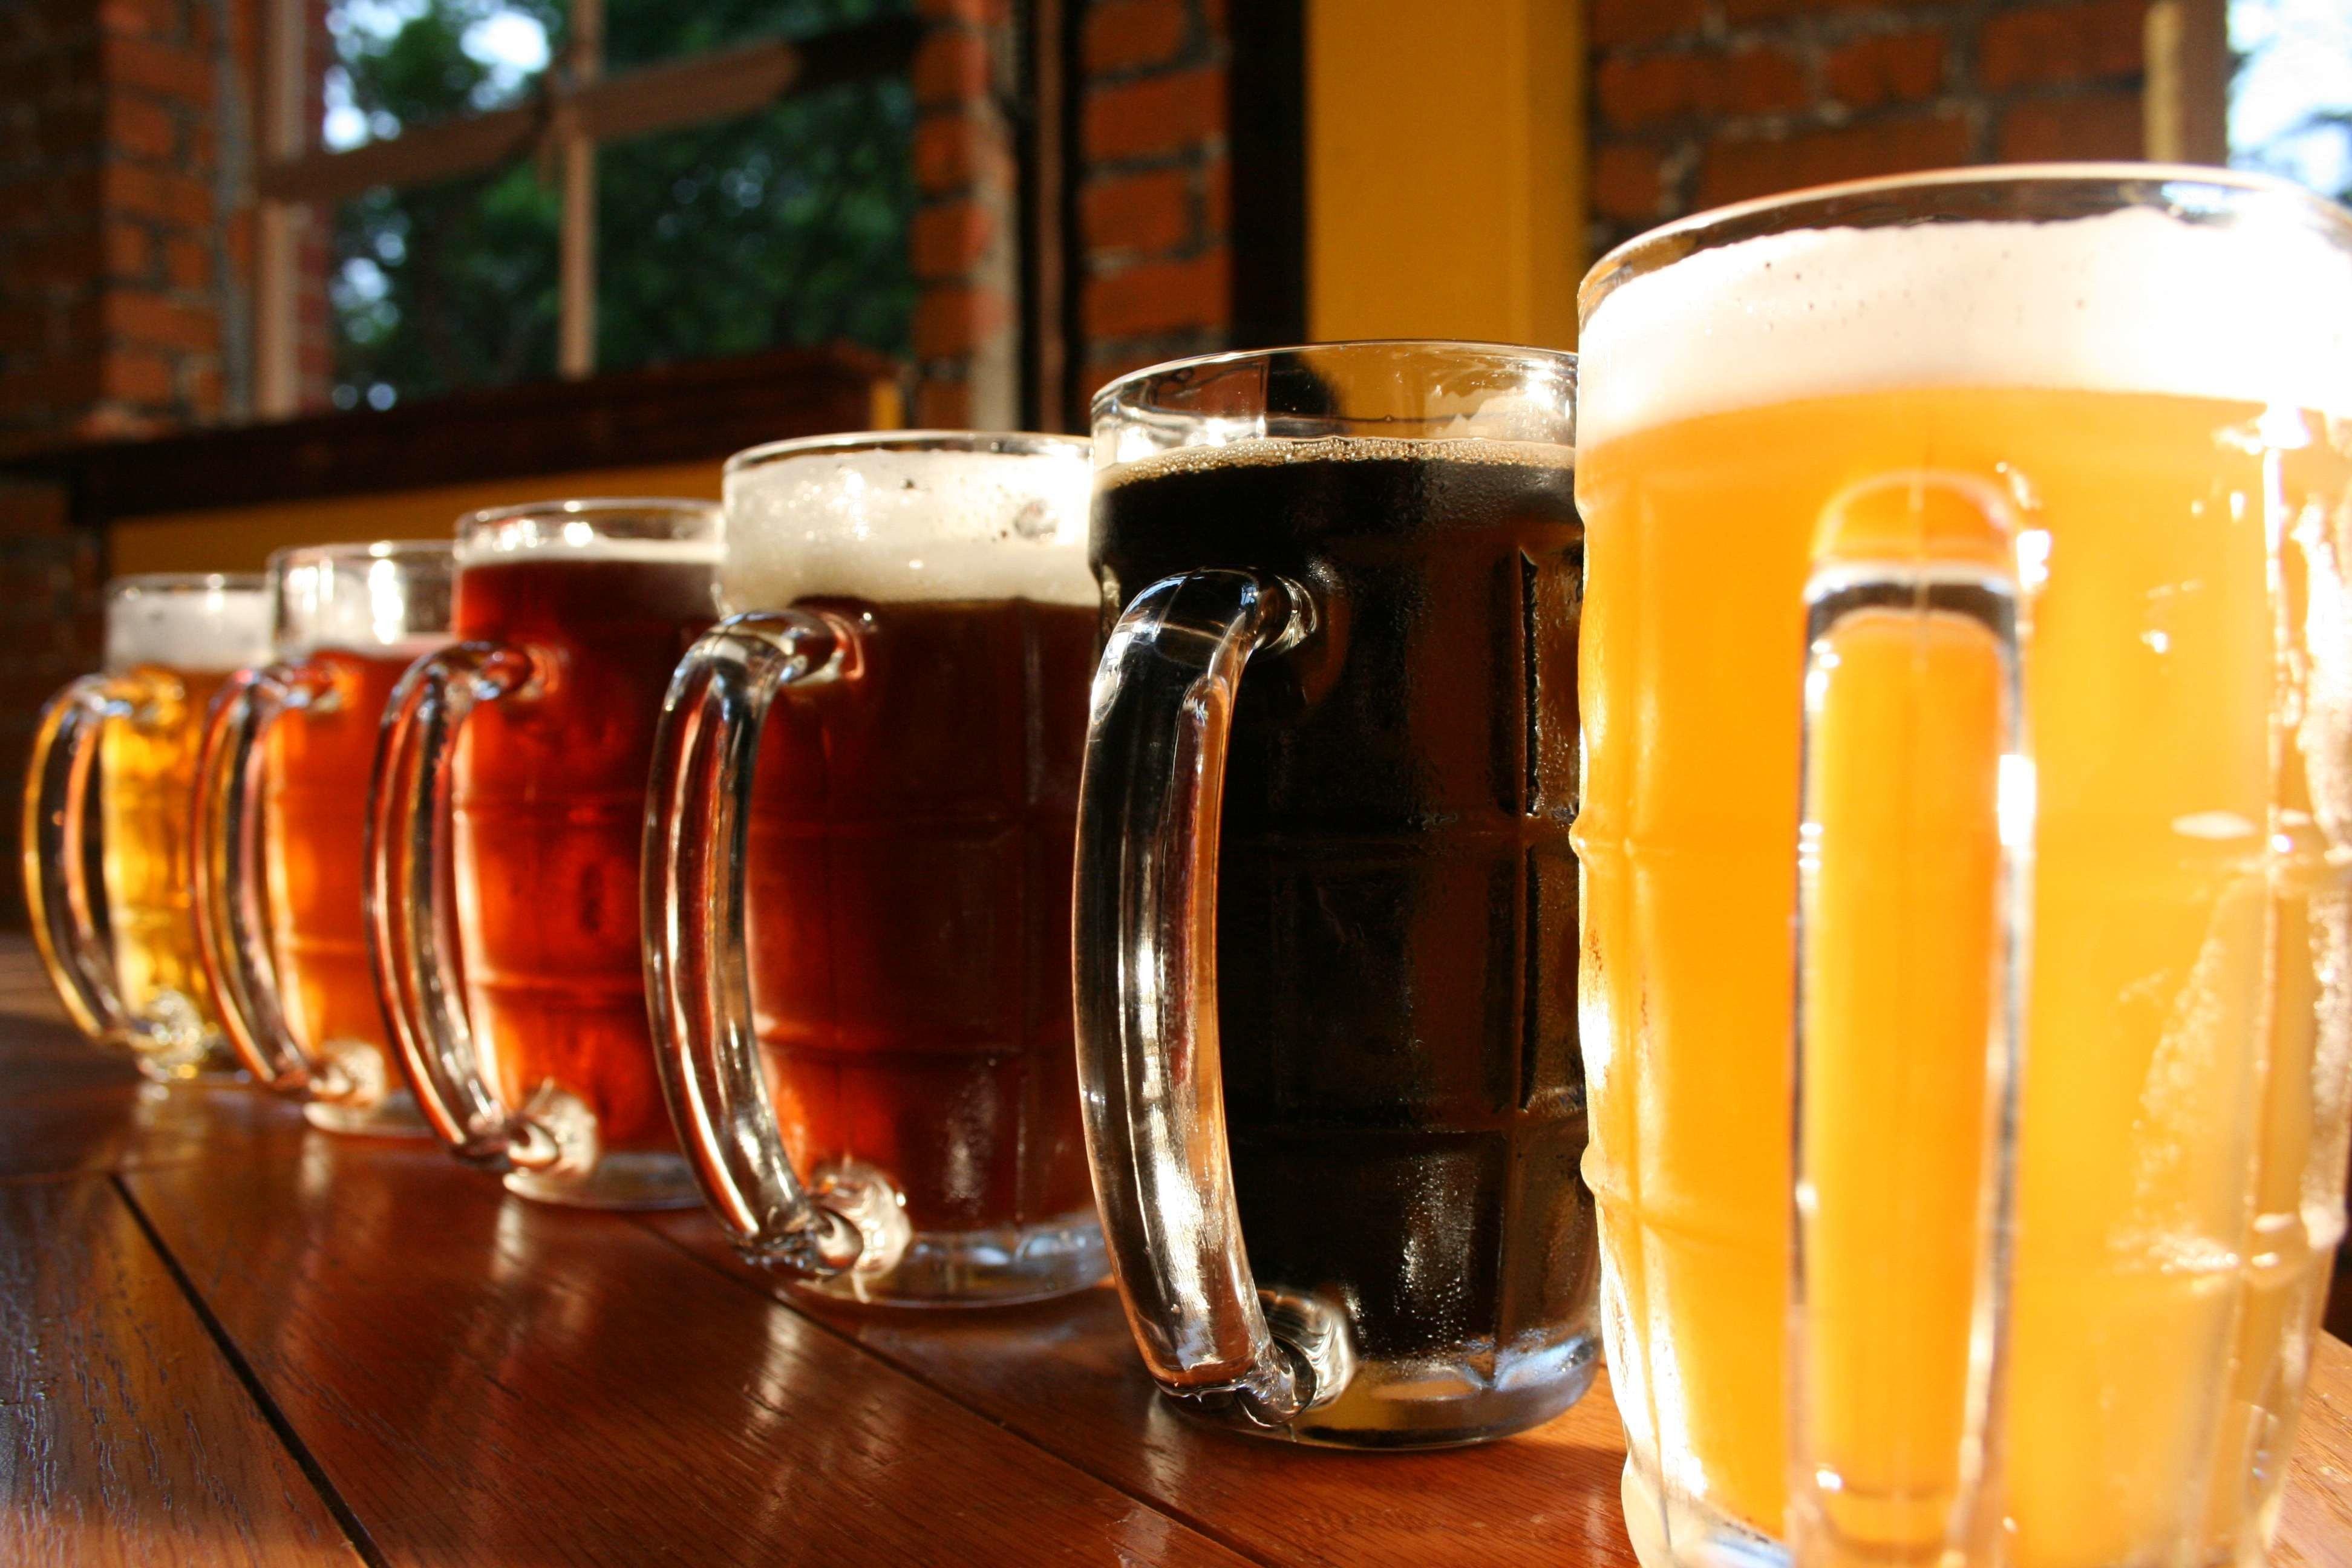 Beer Background image